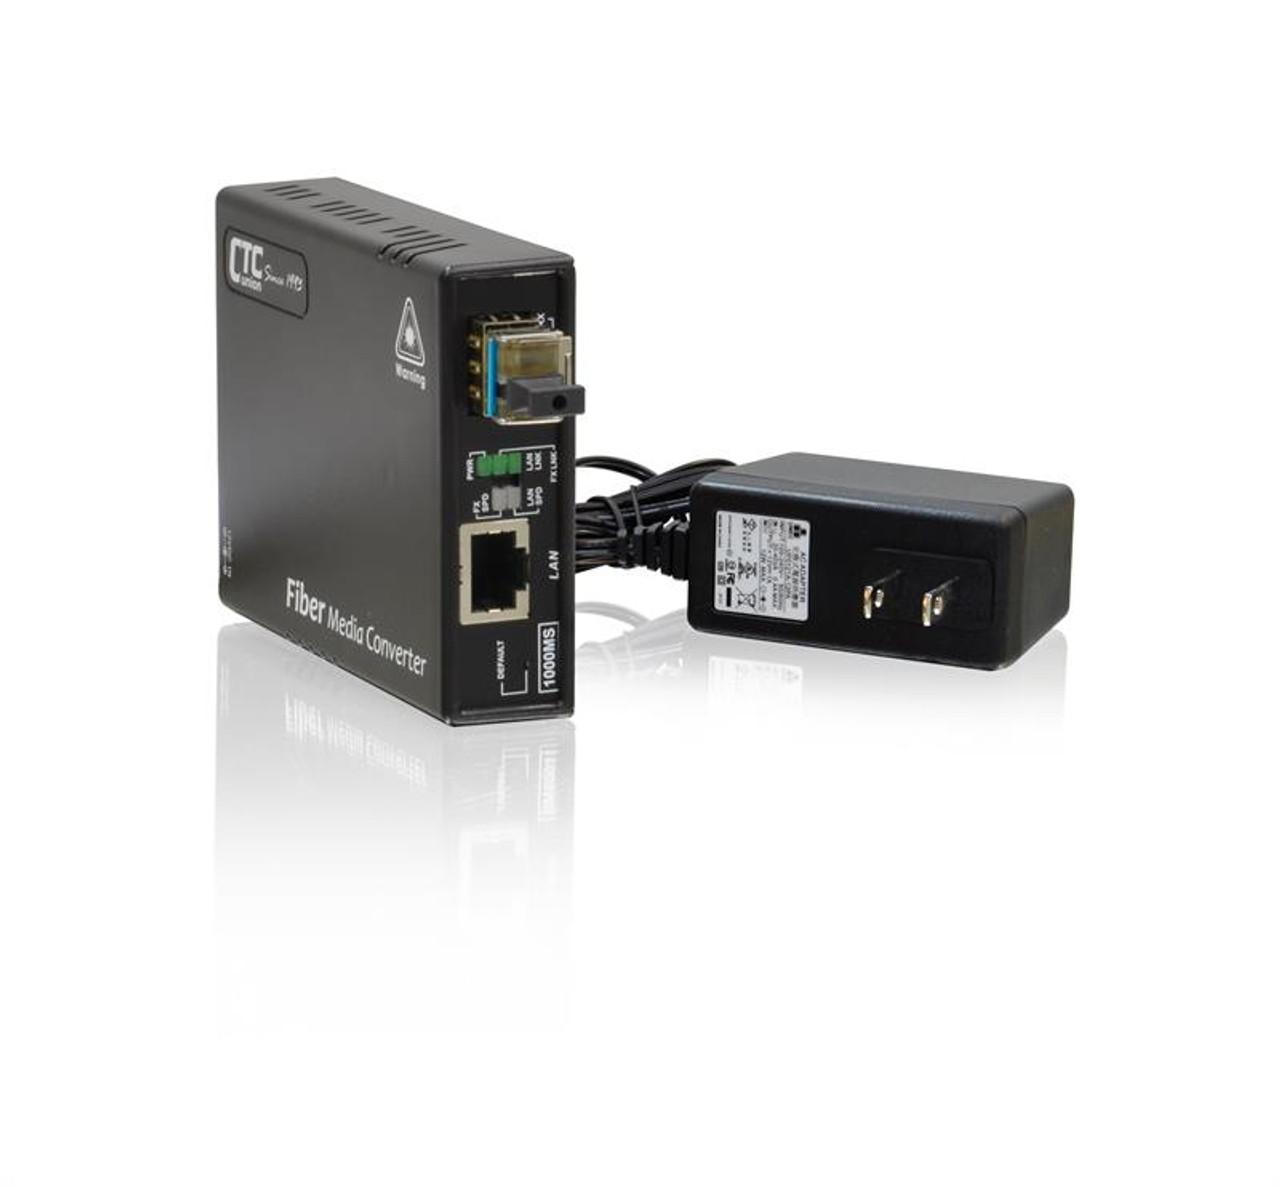 web managed FMC-1000MS Gigabit Ethernet 10//100//1000BaseTx to dual speed SFP slot fiber media converter